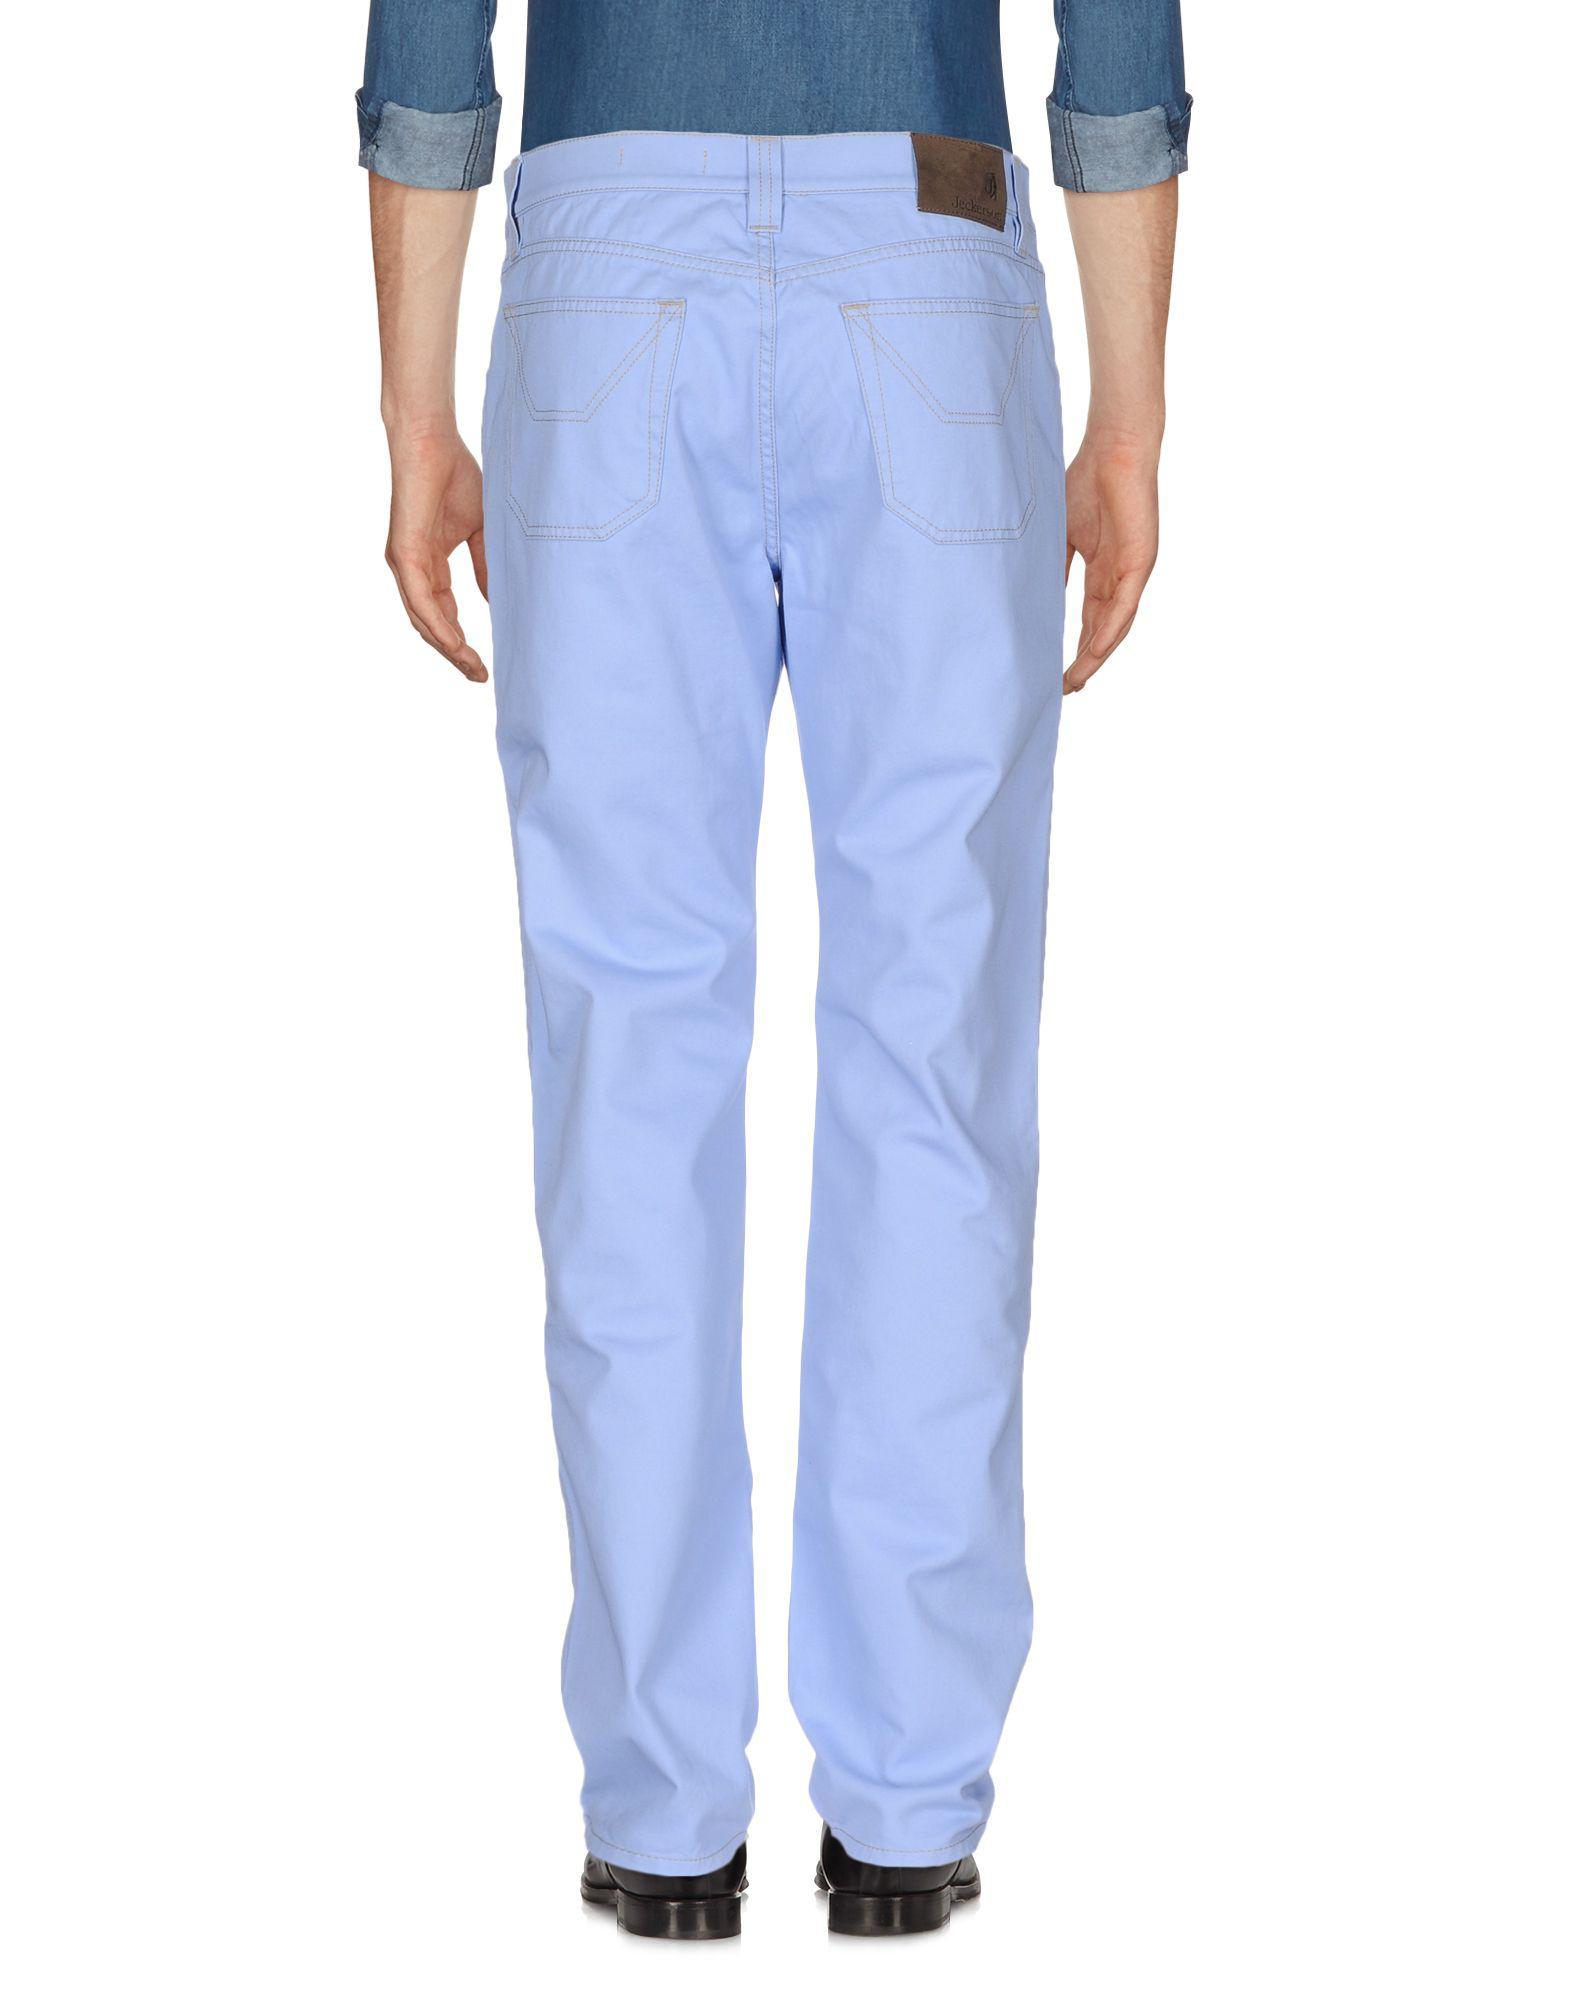 Jeckerson Cotton Casual Trouser in Lilac (Purple) for Men